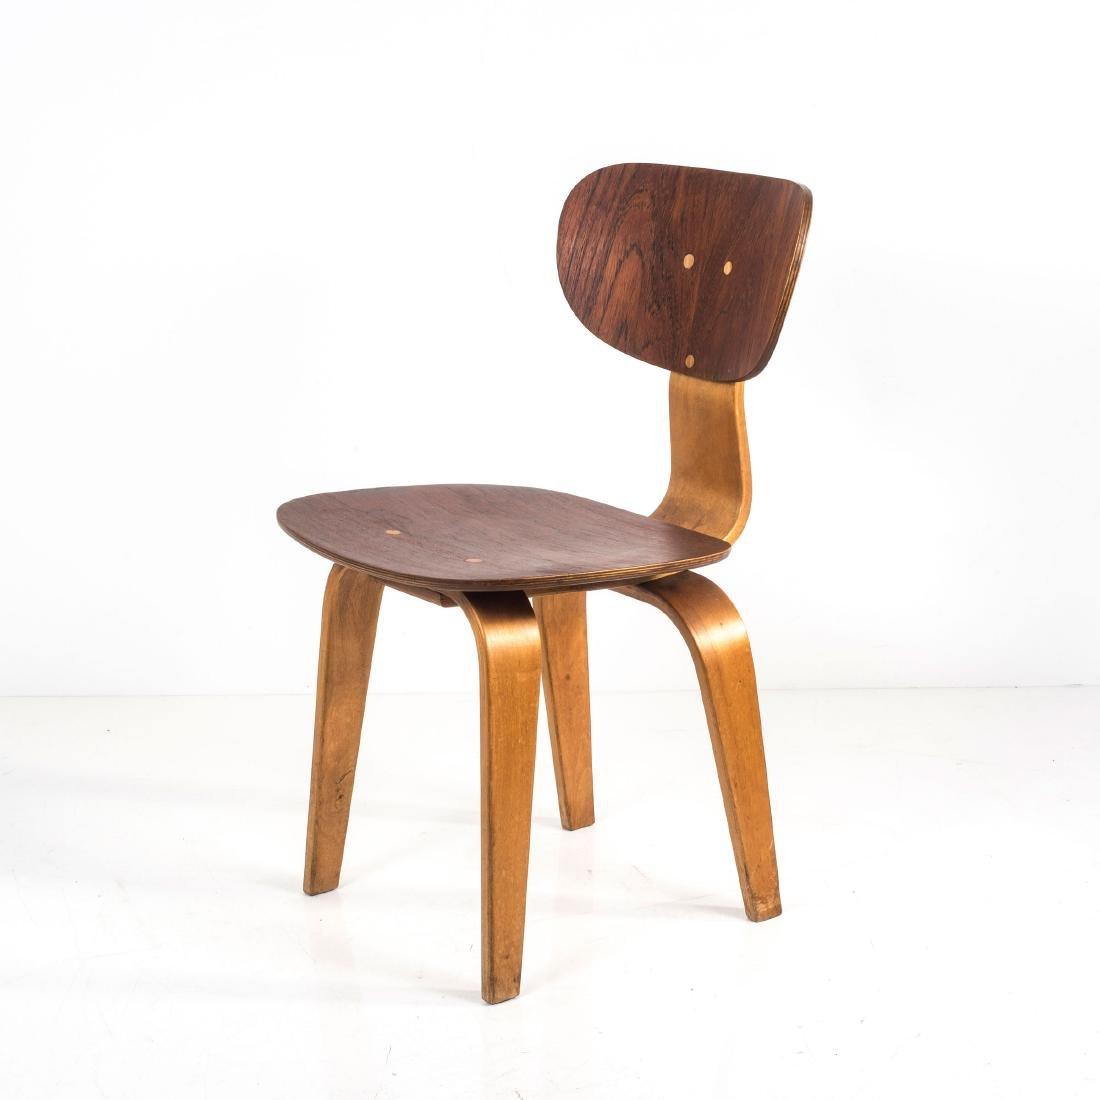 Four 'SB16' chairs, 1955 - 7